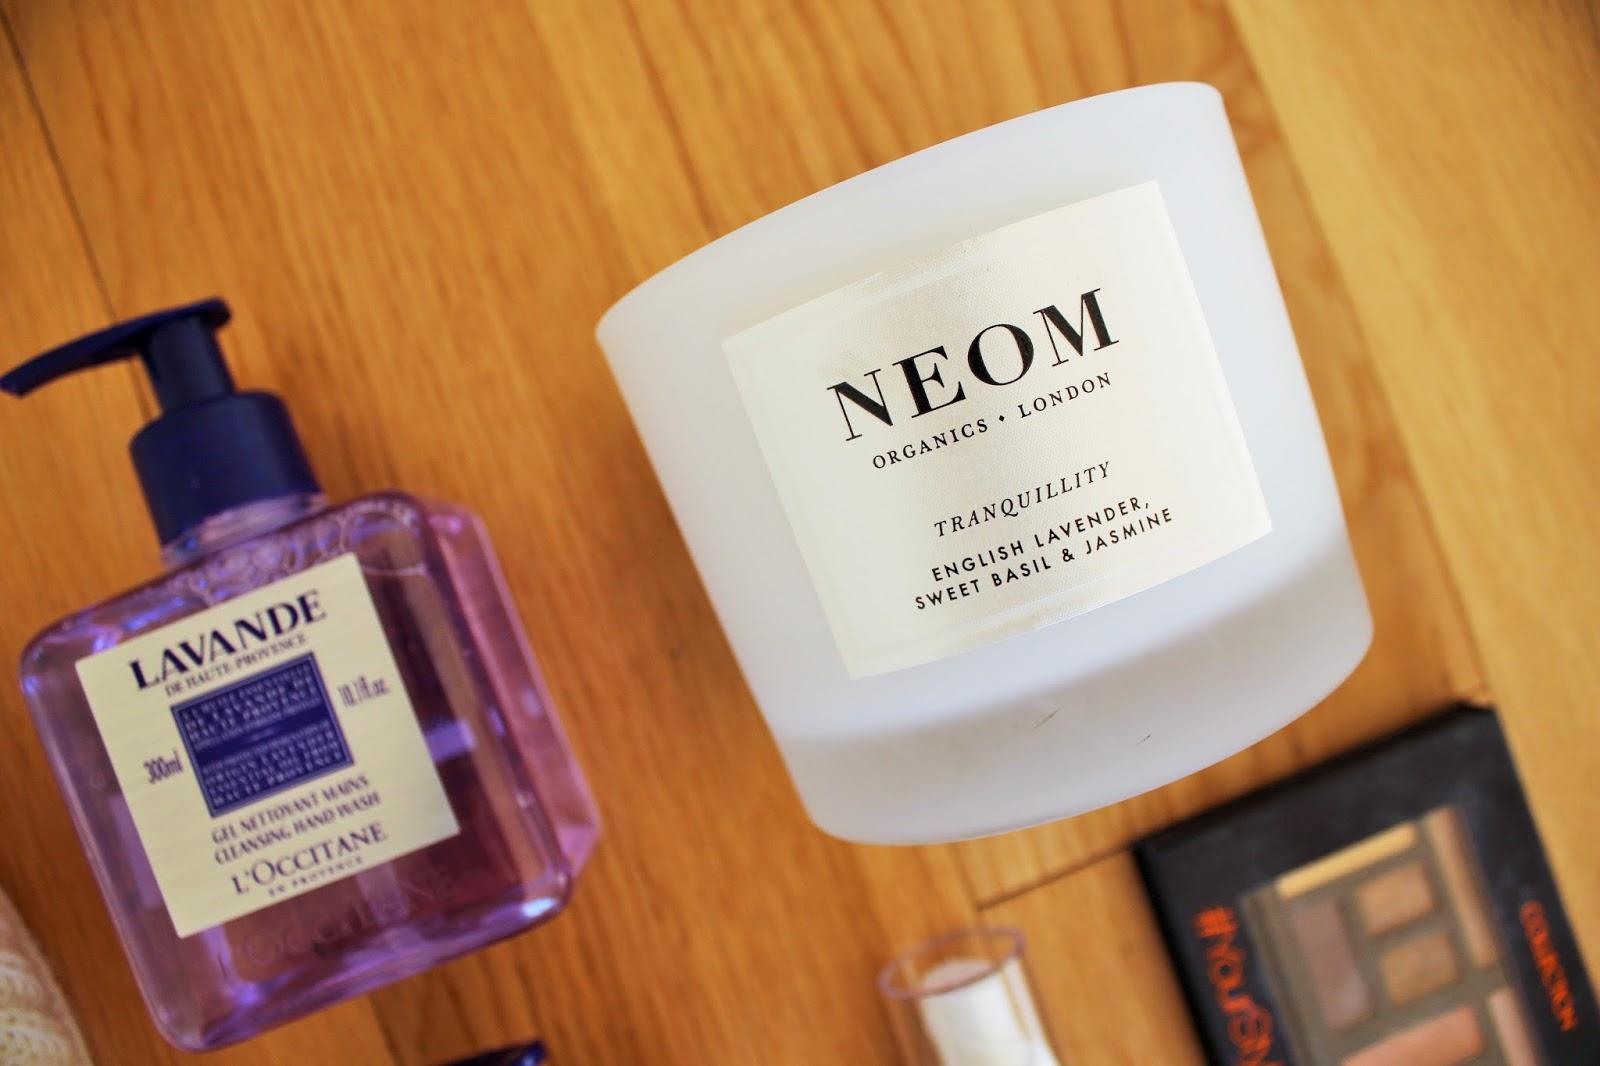 February Favourites - Neom Organics 3 Wick Candle in English Lavender, Sweet Basil and Jasmine